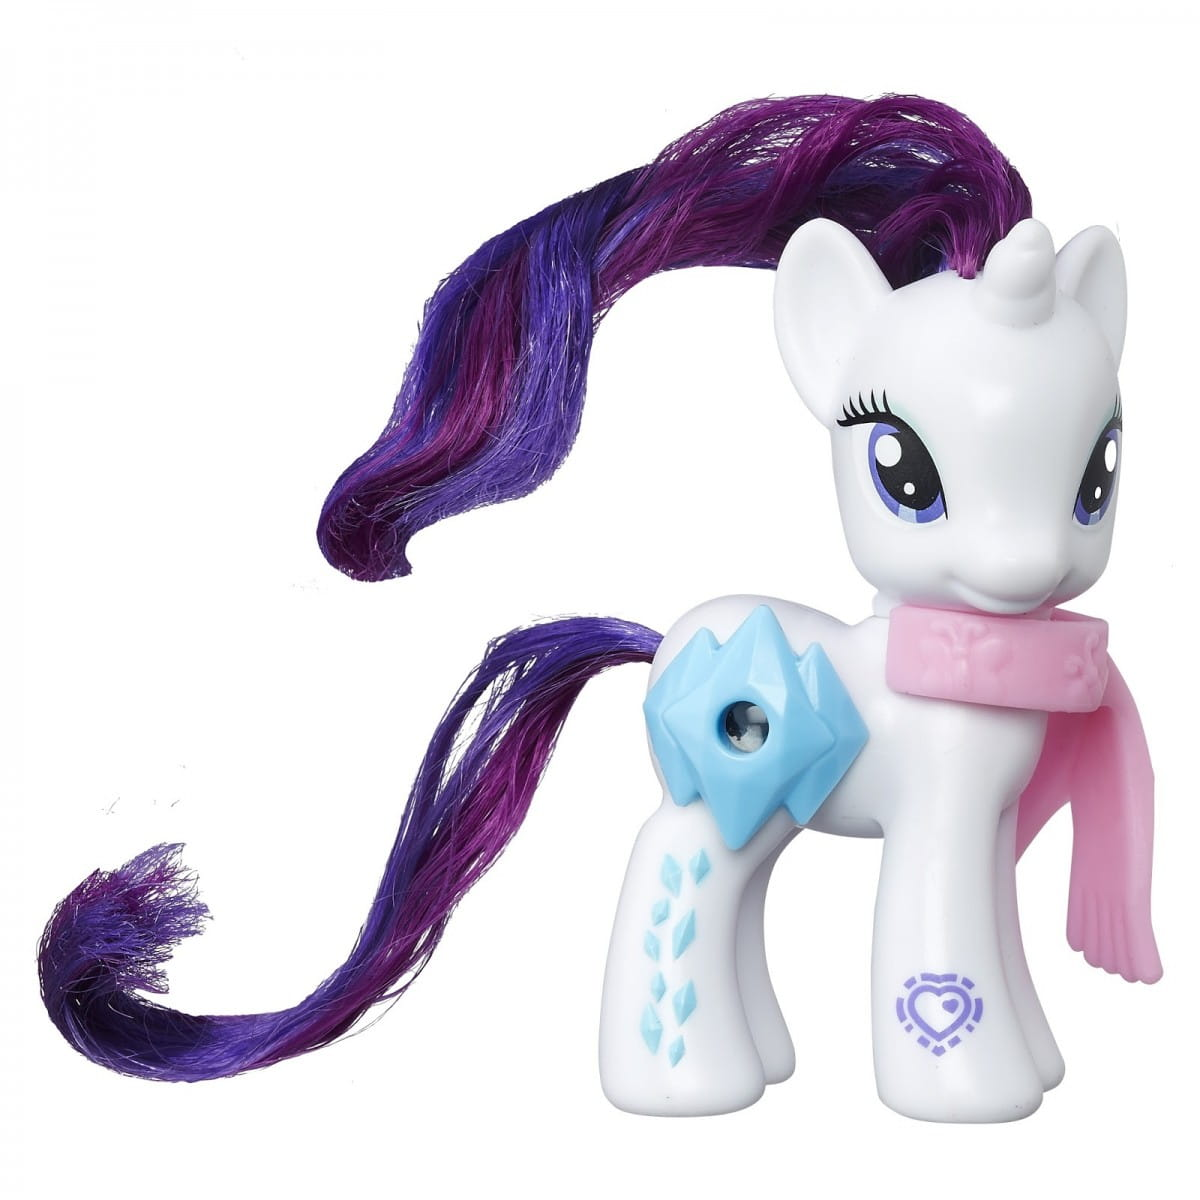 Игровой набор My Little Pony Пони с волшебными картинками  Рарити (HASBRO) - My Little Pony